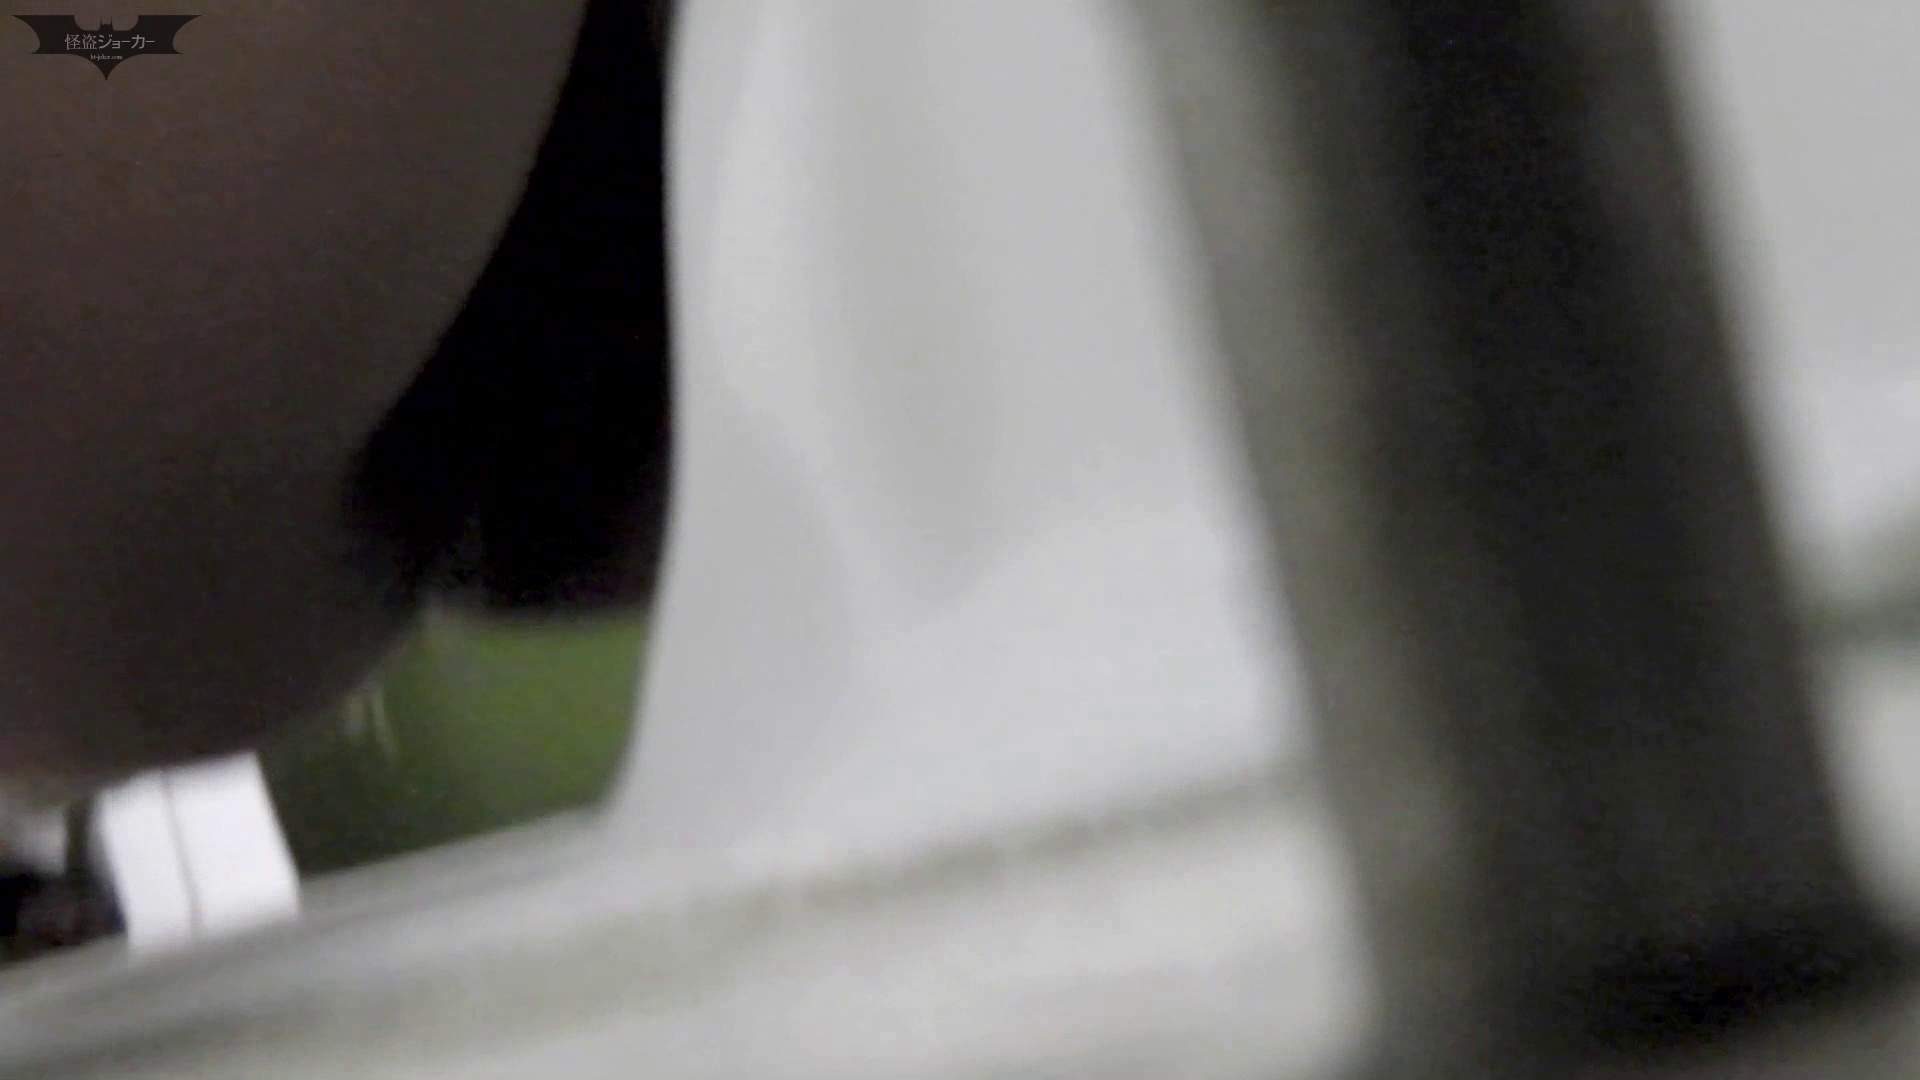 洗面所特攻隊 vol.66 珍事件発生!! 「指」で出【2015・05位】 盛合せ エロ無料画像 80枚 51